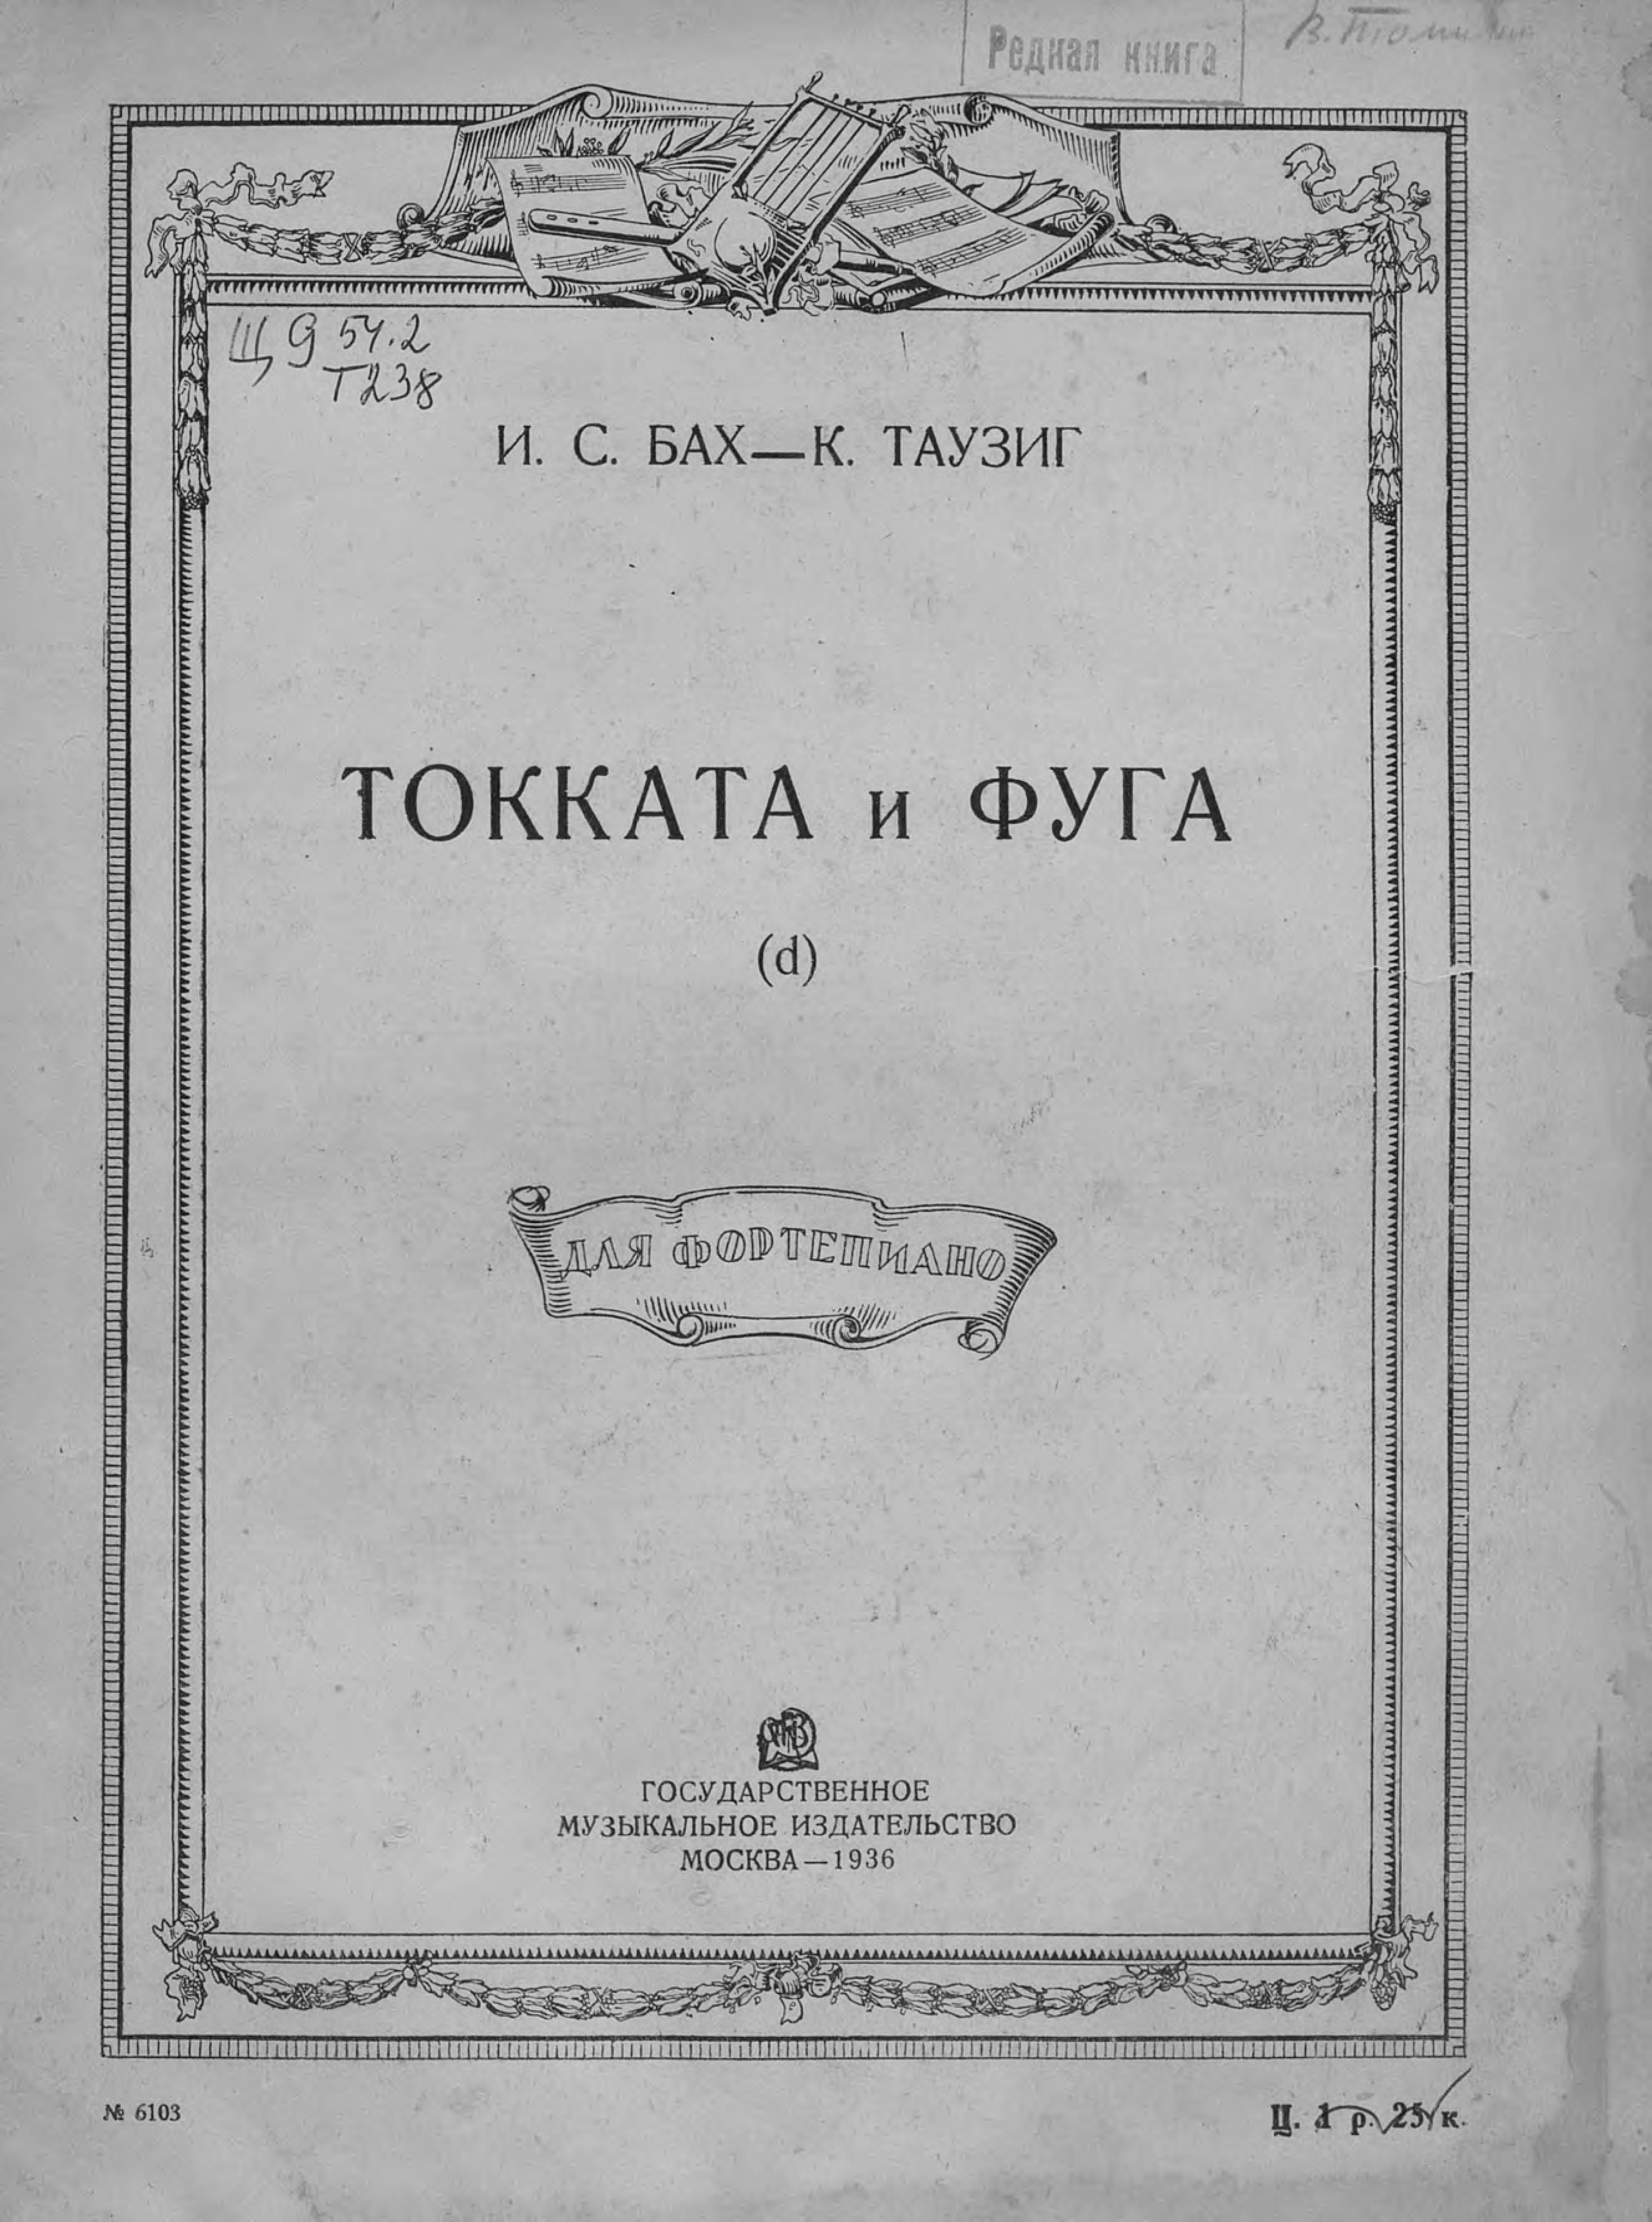 Иоганн Себастьян Бах Токката и фуга (d) иоганн себастьян бах хроматическая фантазия и фуга